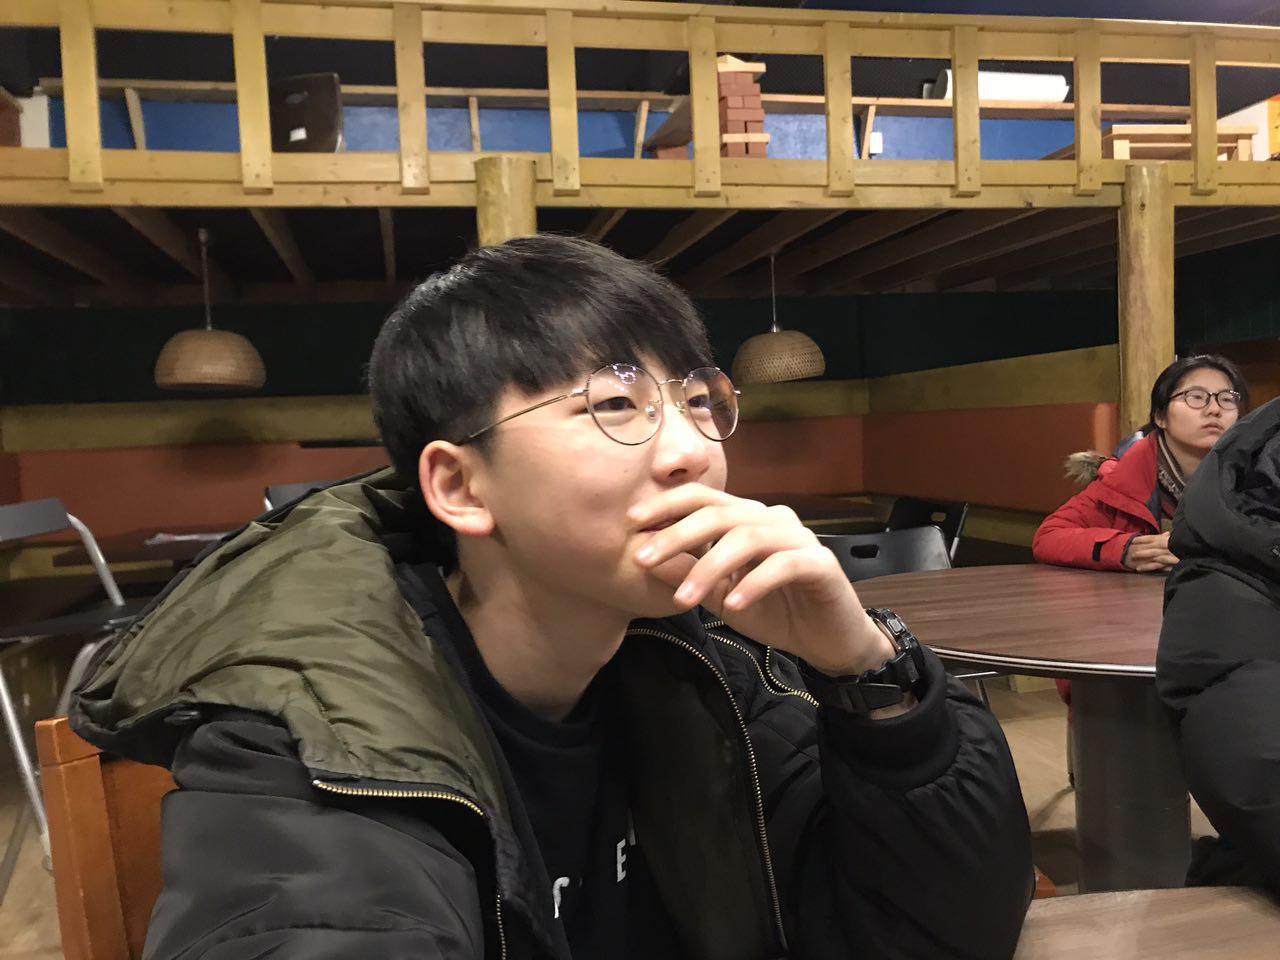 photo_2018-01-13_17-51-10.jpg